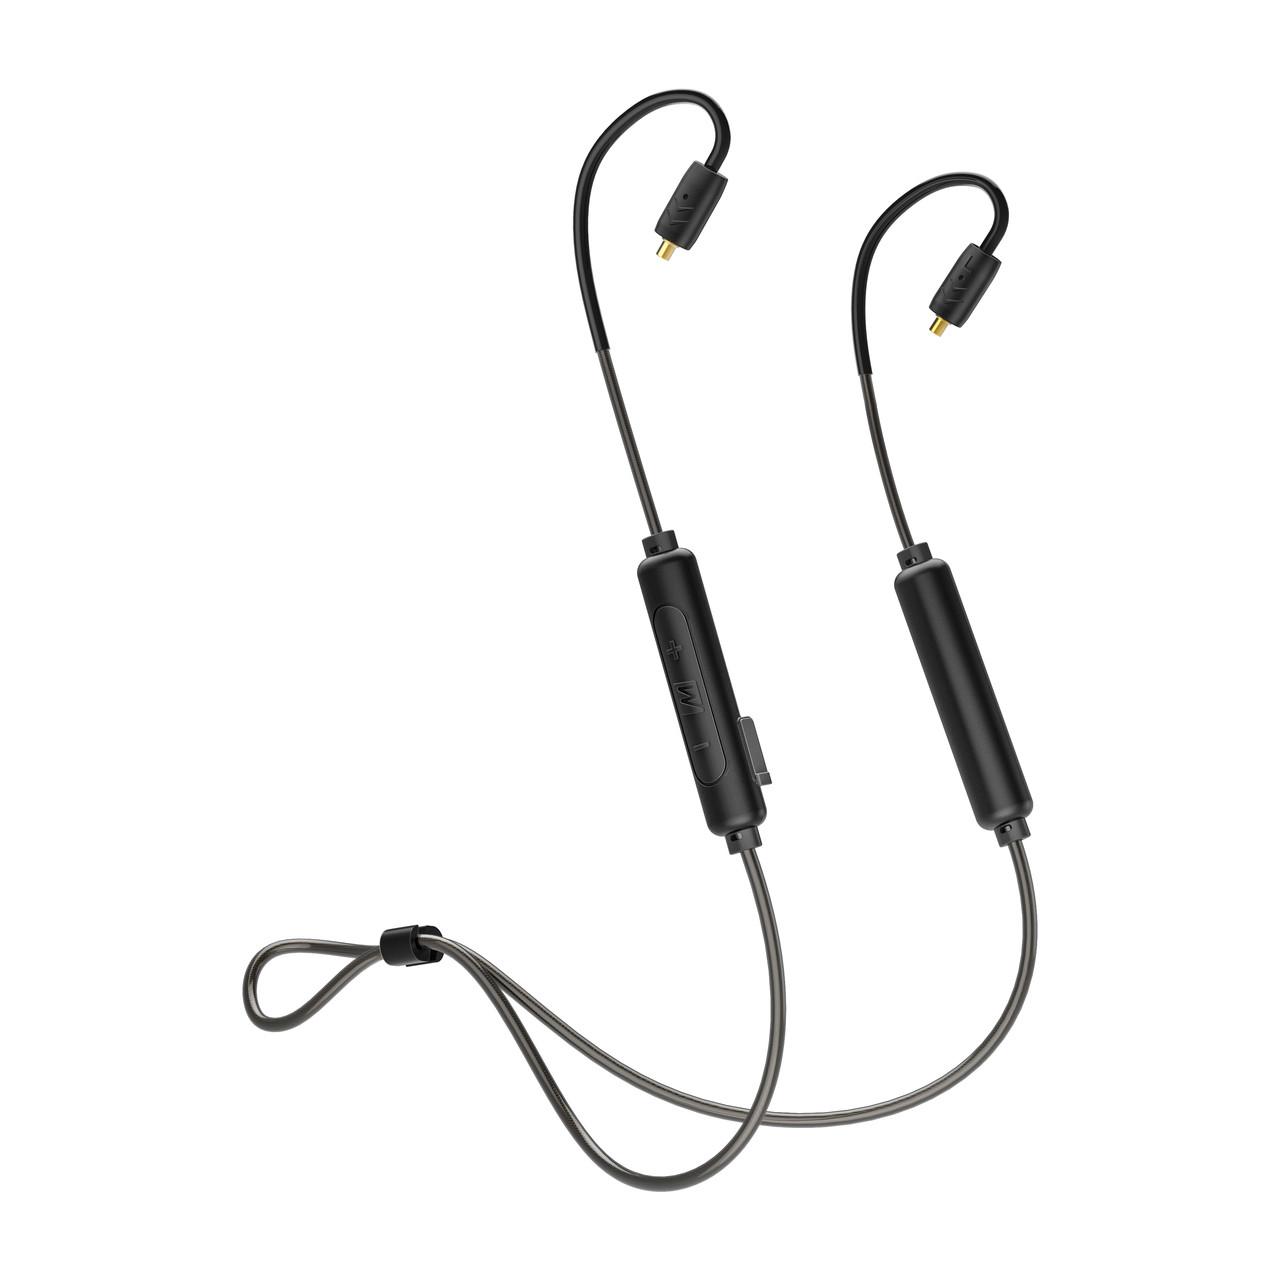 mee audio btx2 bluetooth wireless universal mmcx adapter cable with qualcomm qualcomm u00ae aptx u2122 and